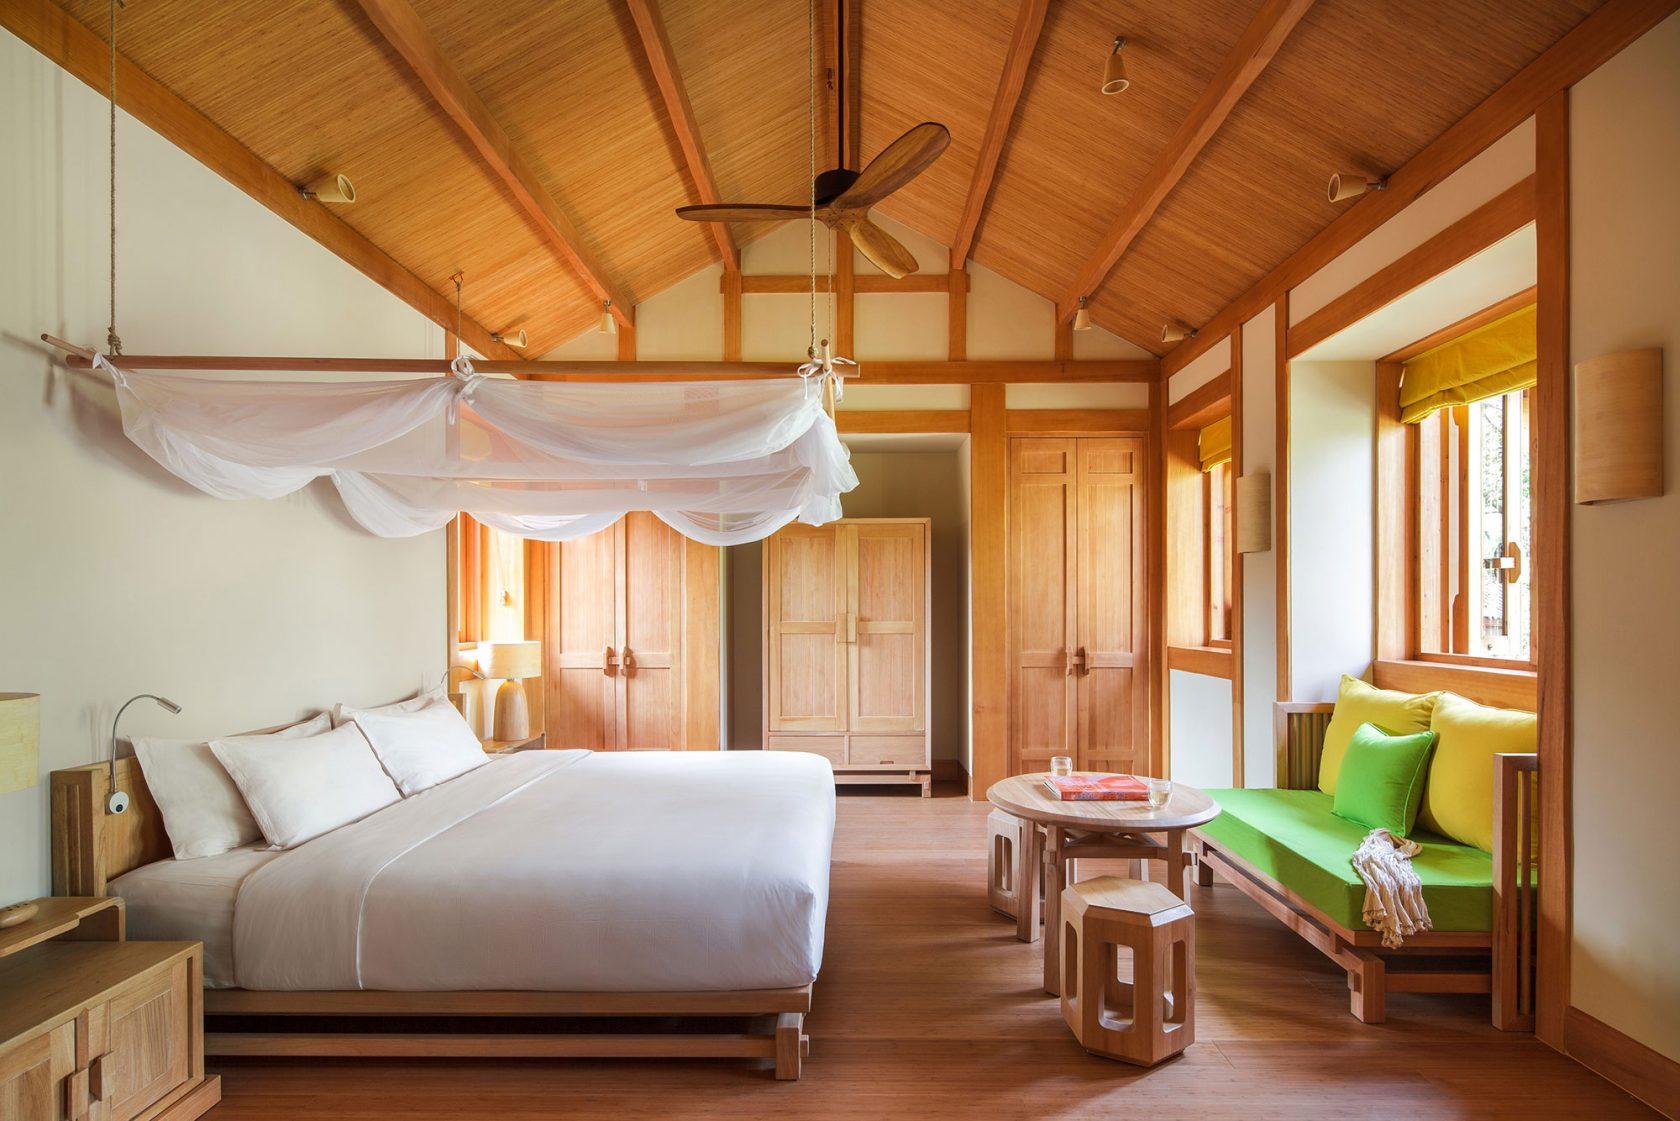 Six Senses Qing Cheng Mountain Deluxe Suite